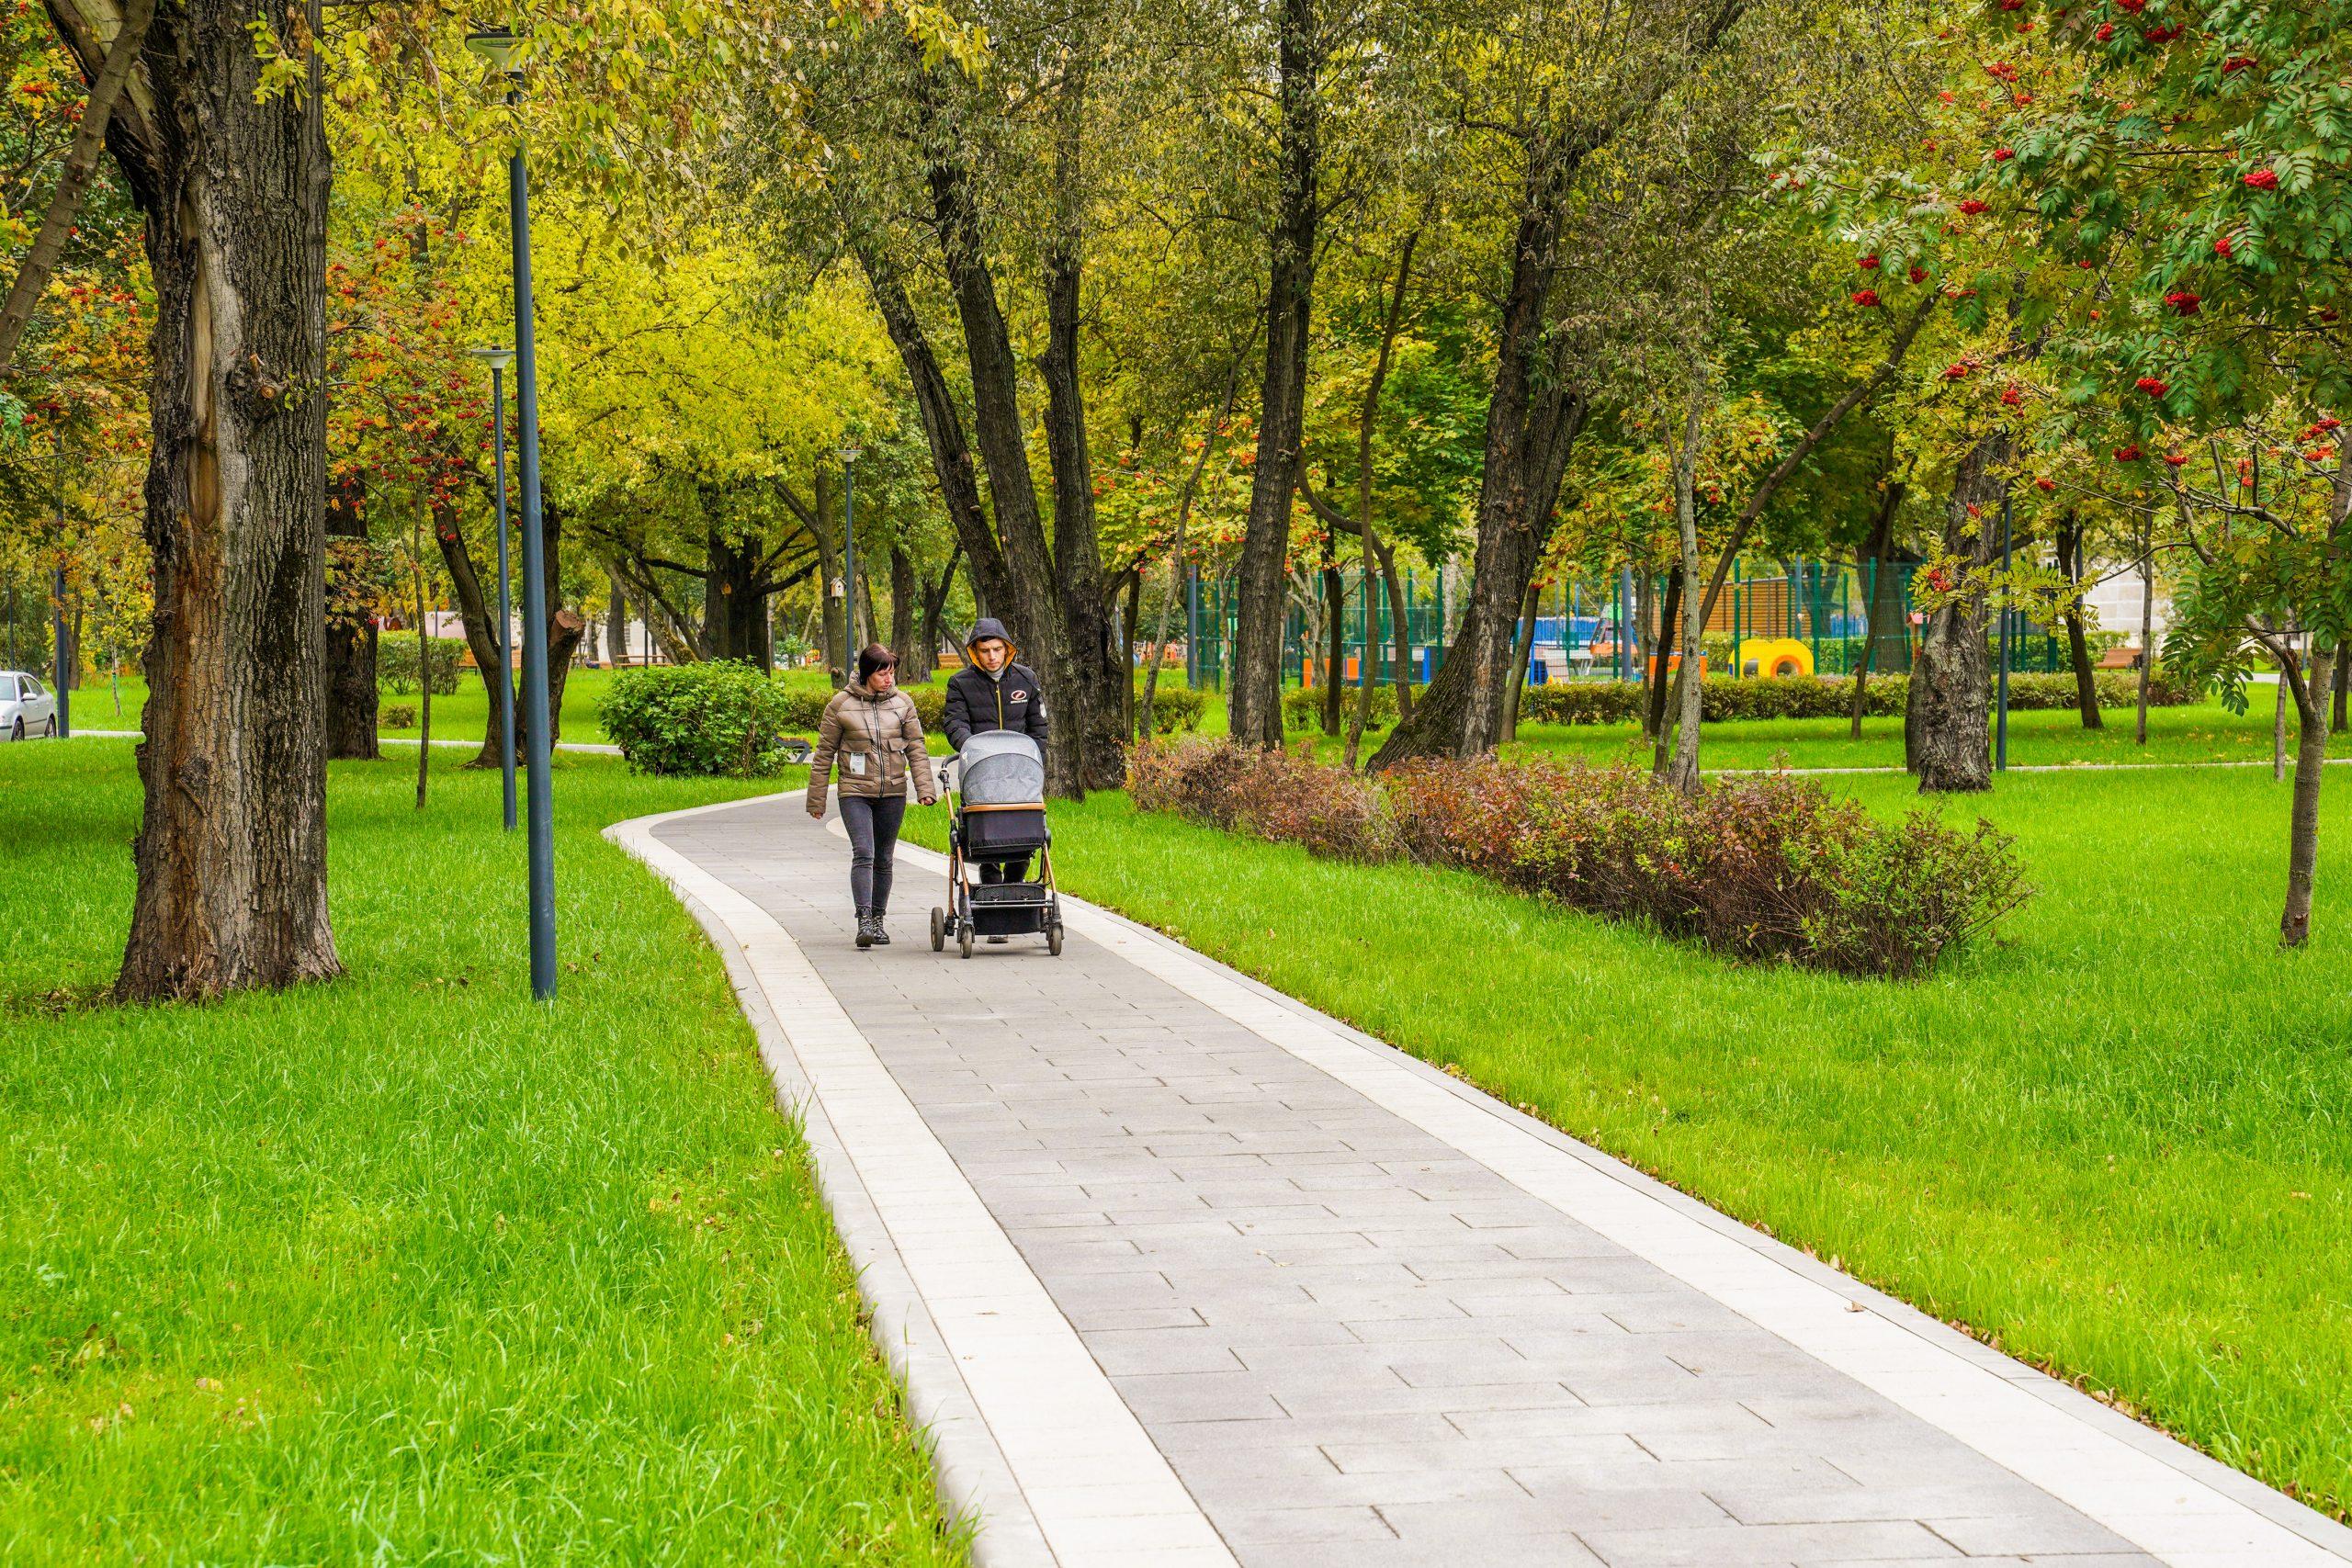 парк Карачарово, дорожка, благоустройство, коляска